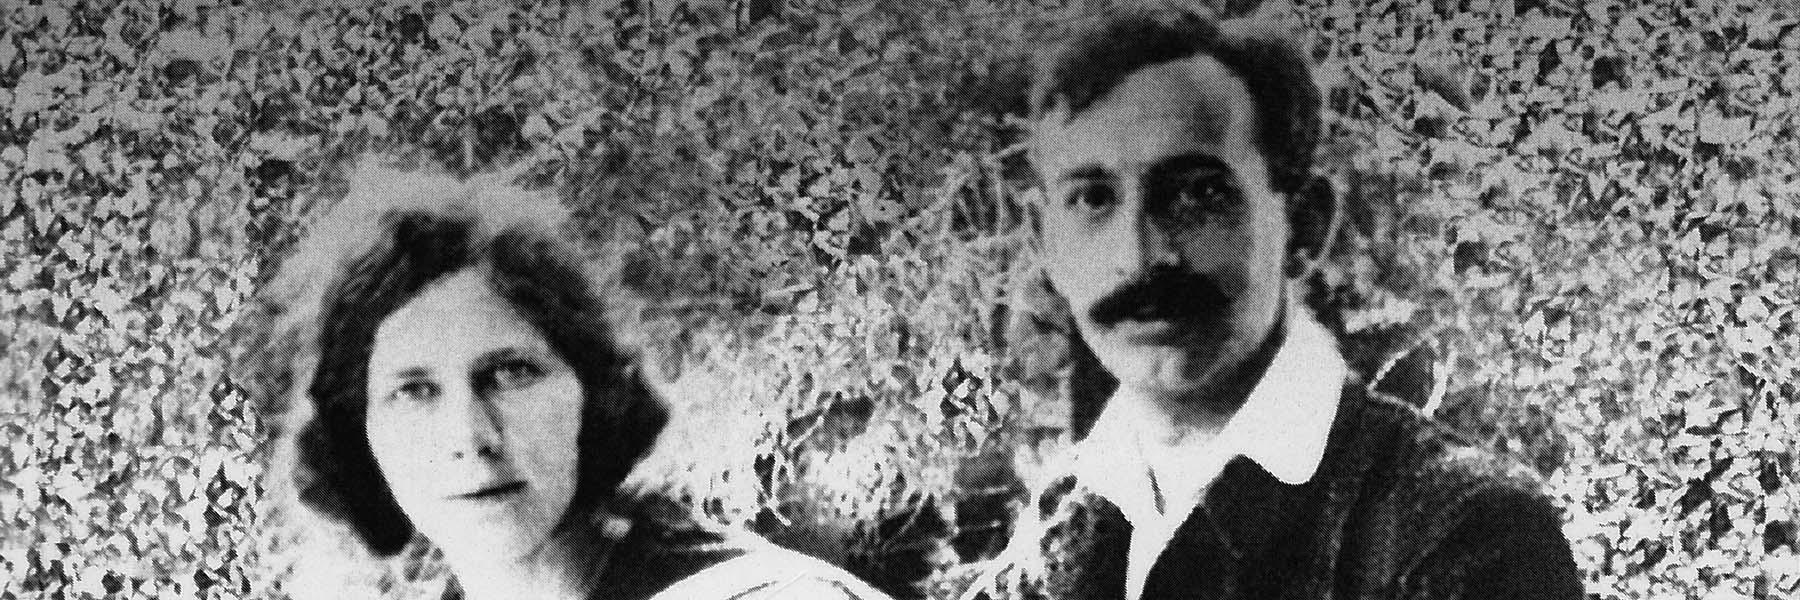 Gli Einstein italiani <br />trucidati dai nazisti